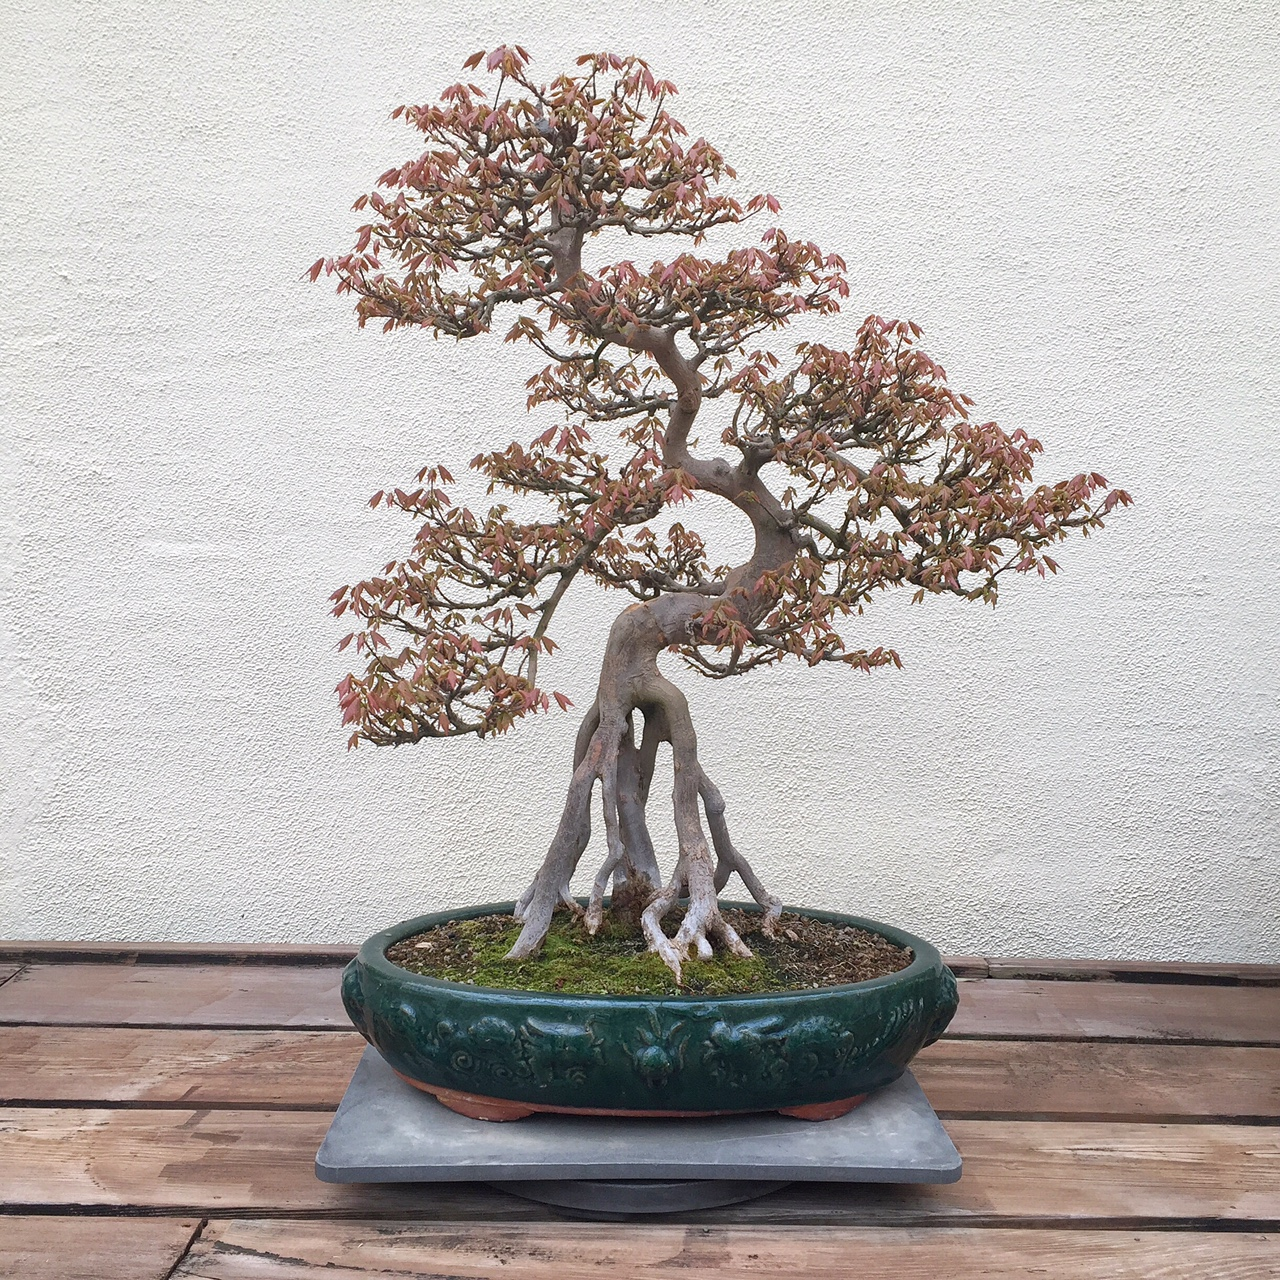 Mature bonsai